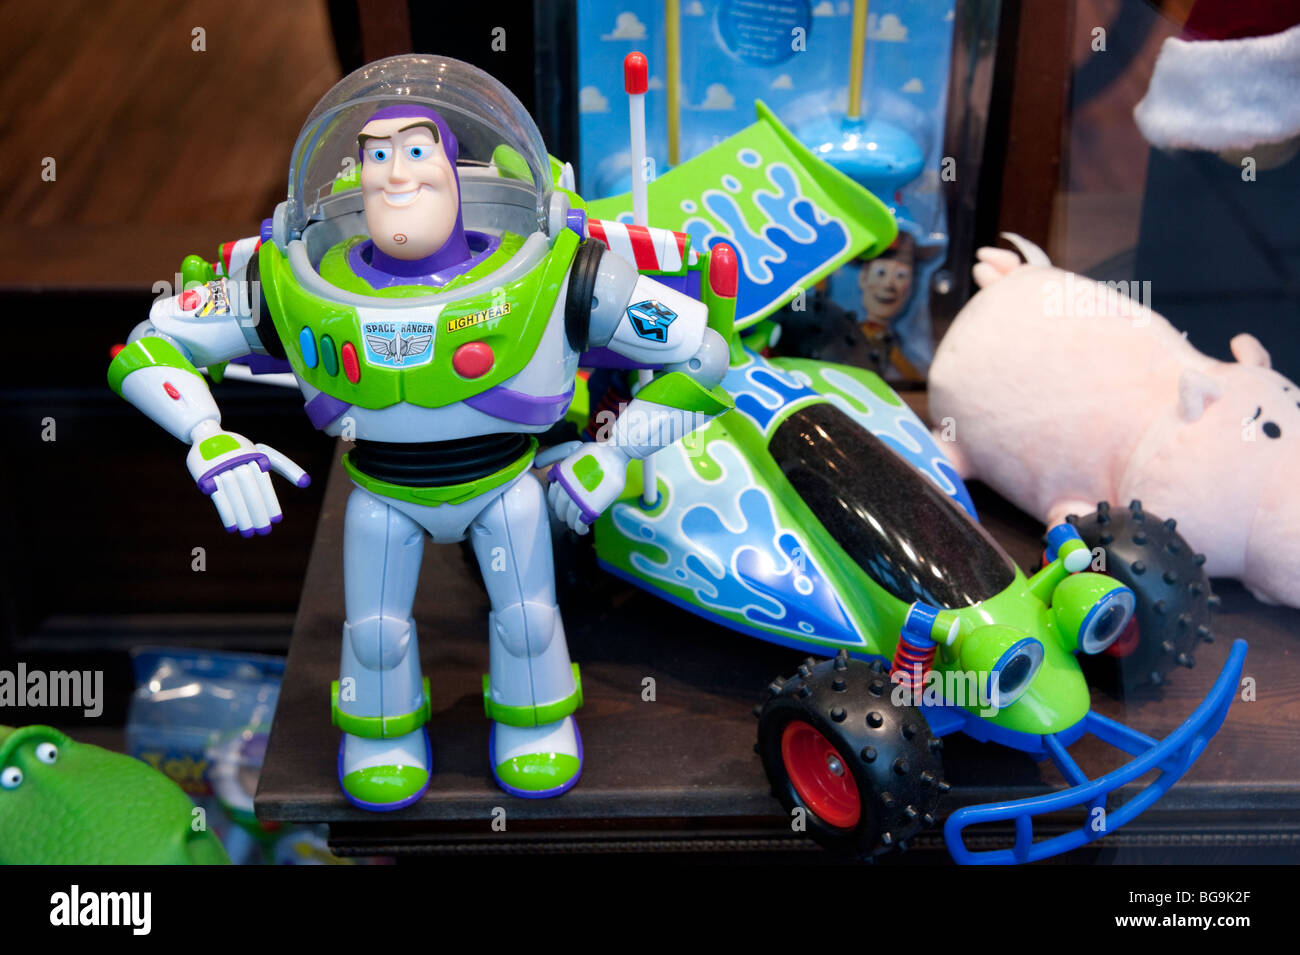 Buzz Lightyear toys in shop window, England, Britain, UK - Stock Image